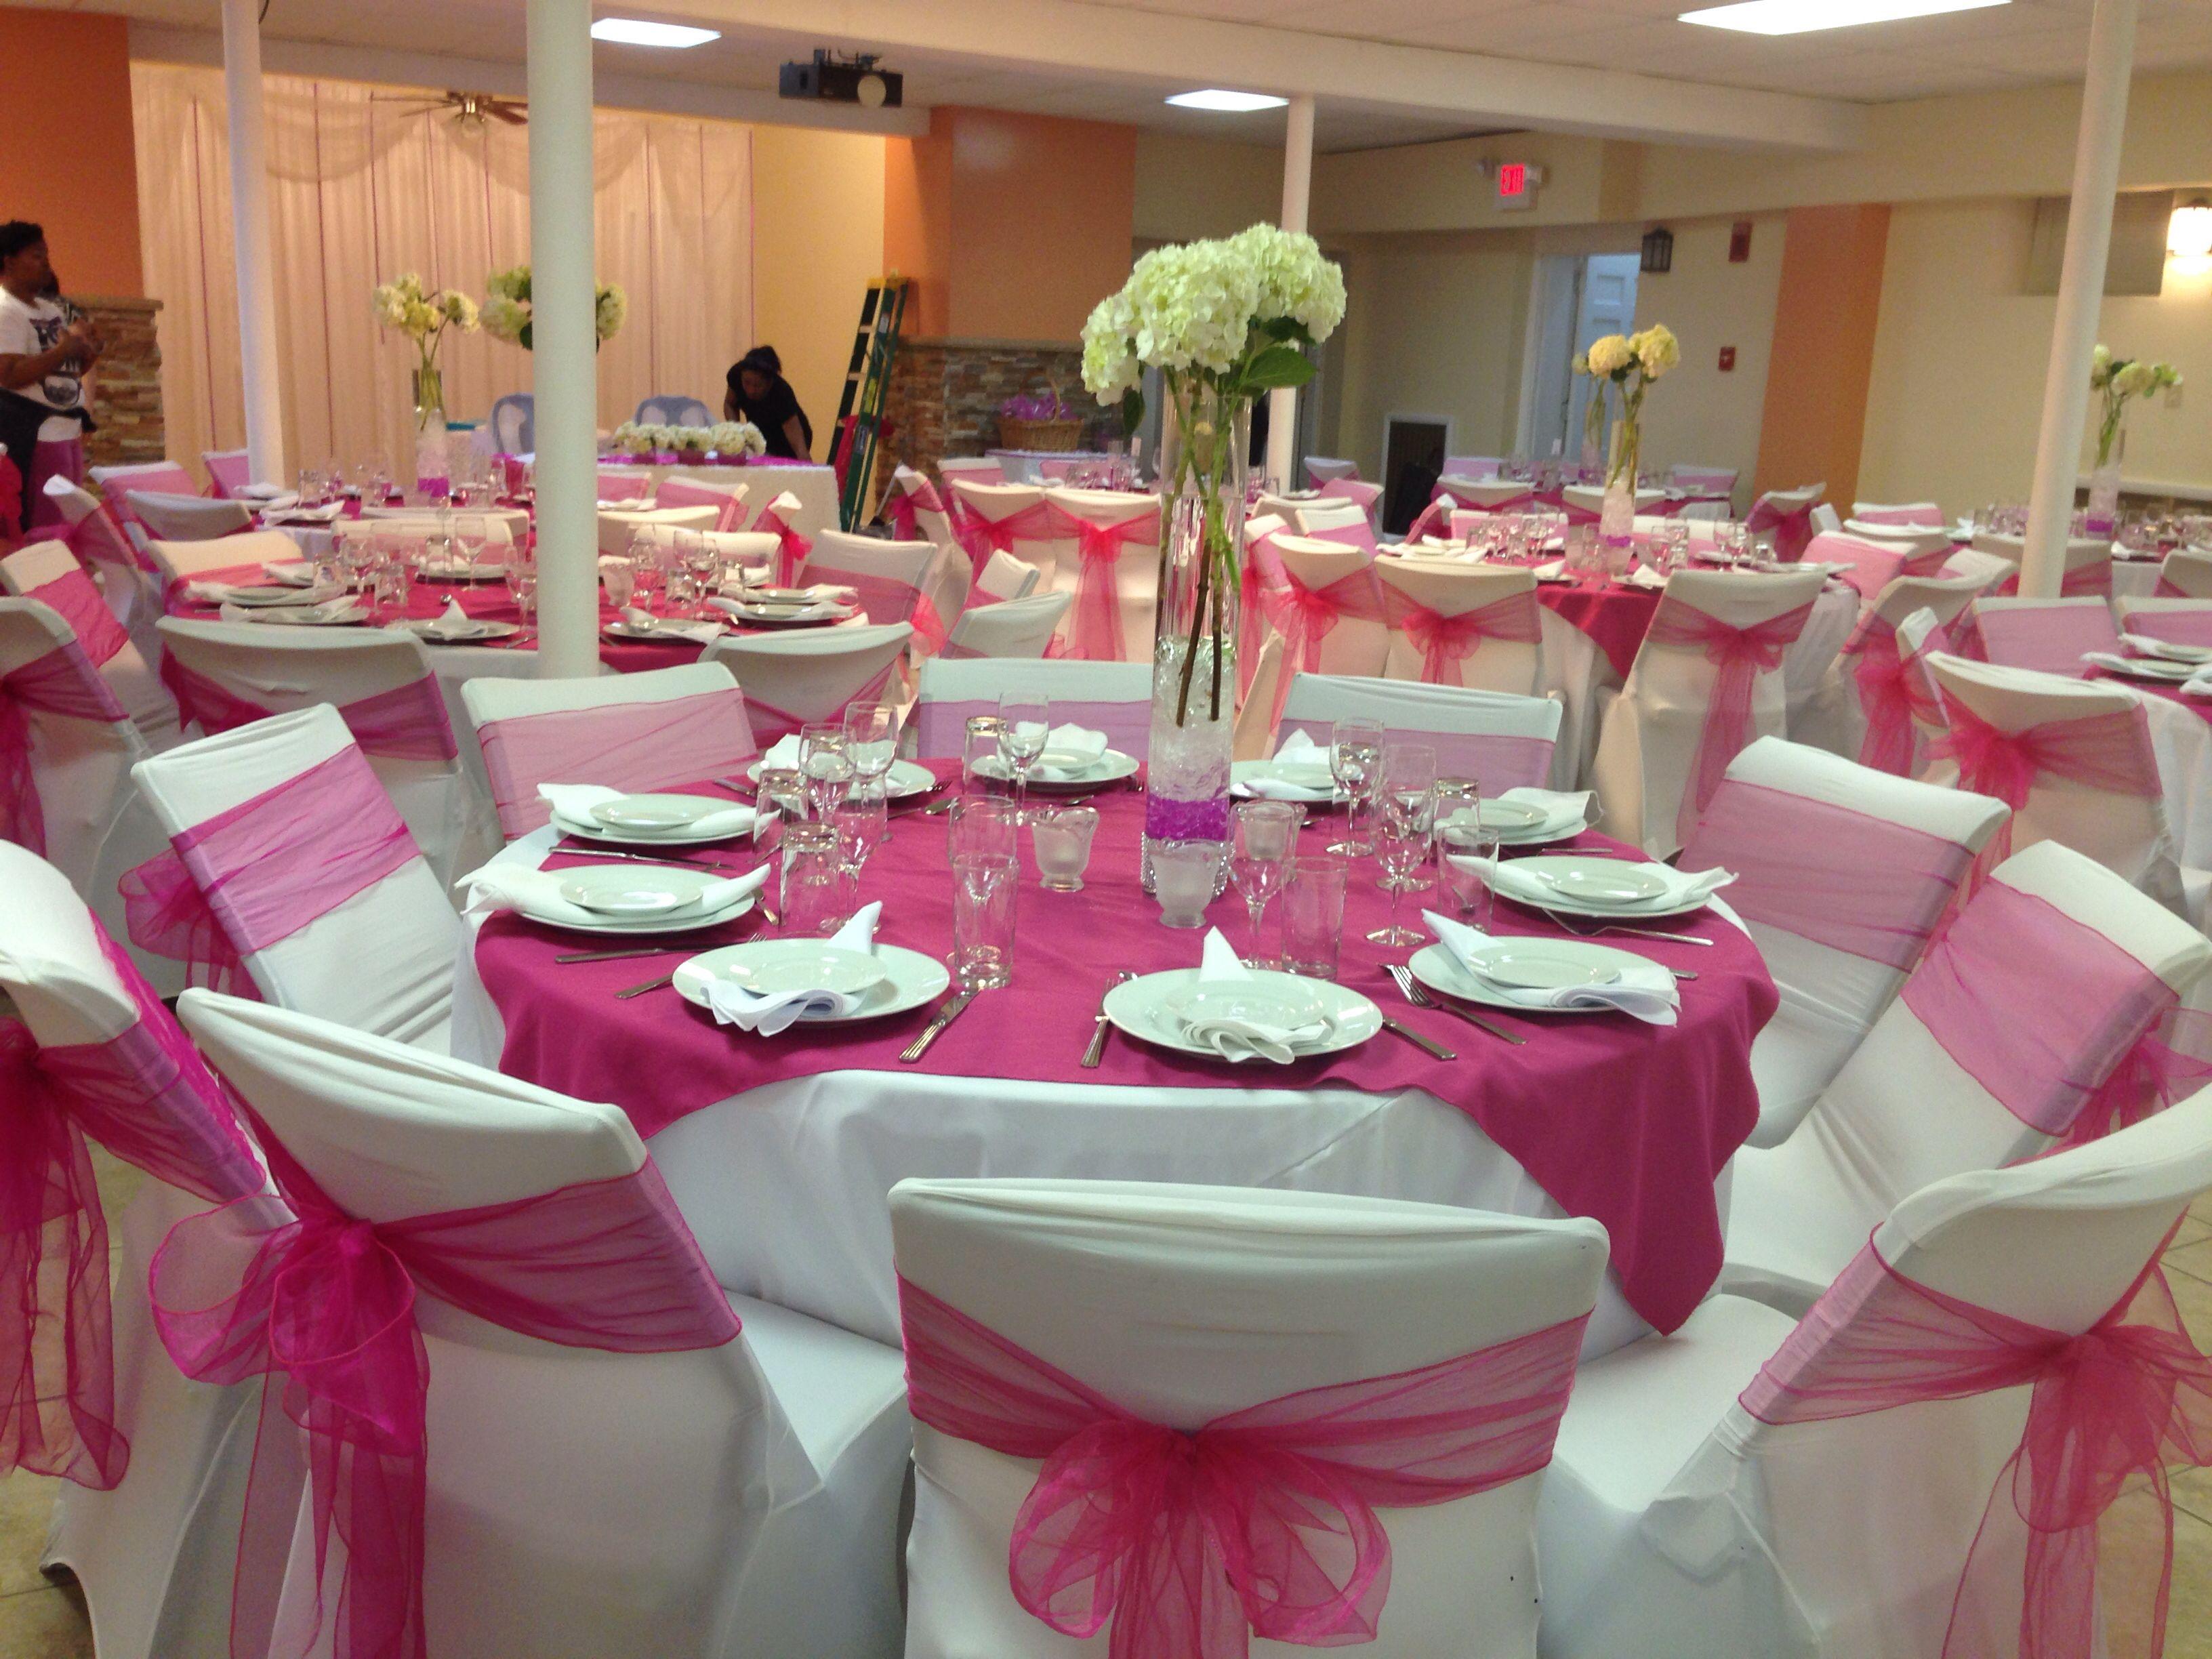 Decoration Of A Fuchsia Wedding Table Center Piece Wait Flowers Wedding Table Centres Table Centerpieces Fuchsia Wedding